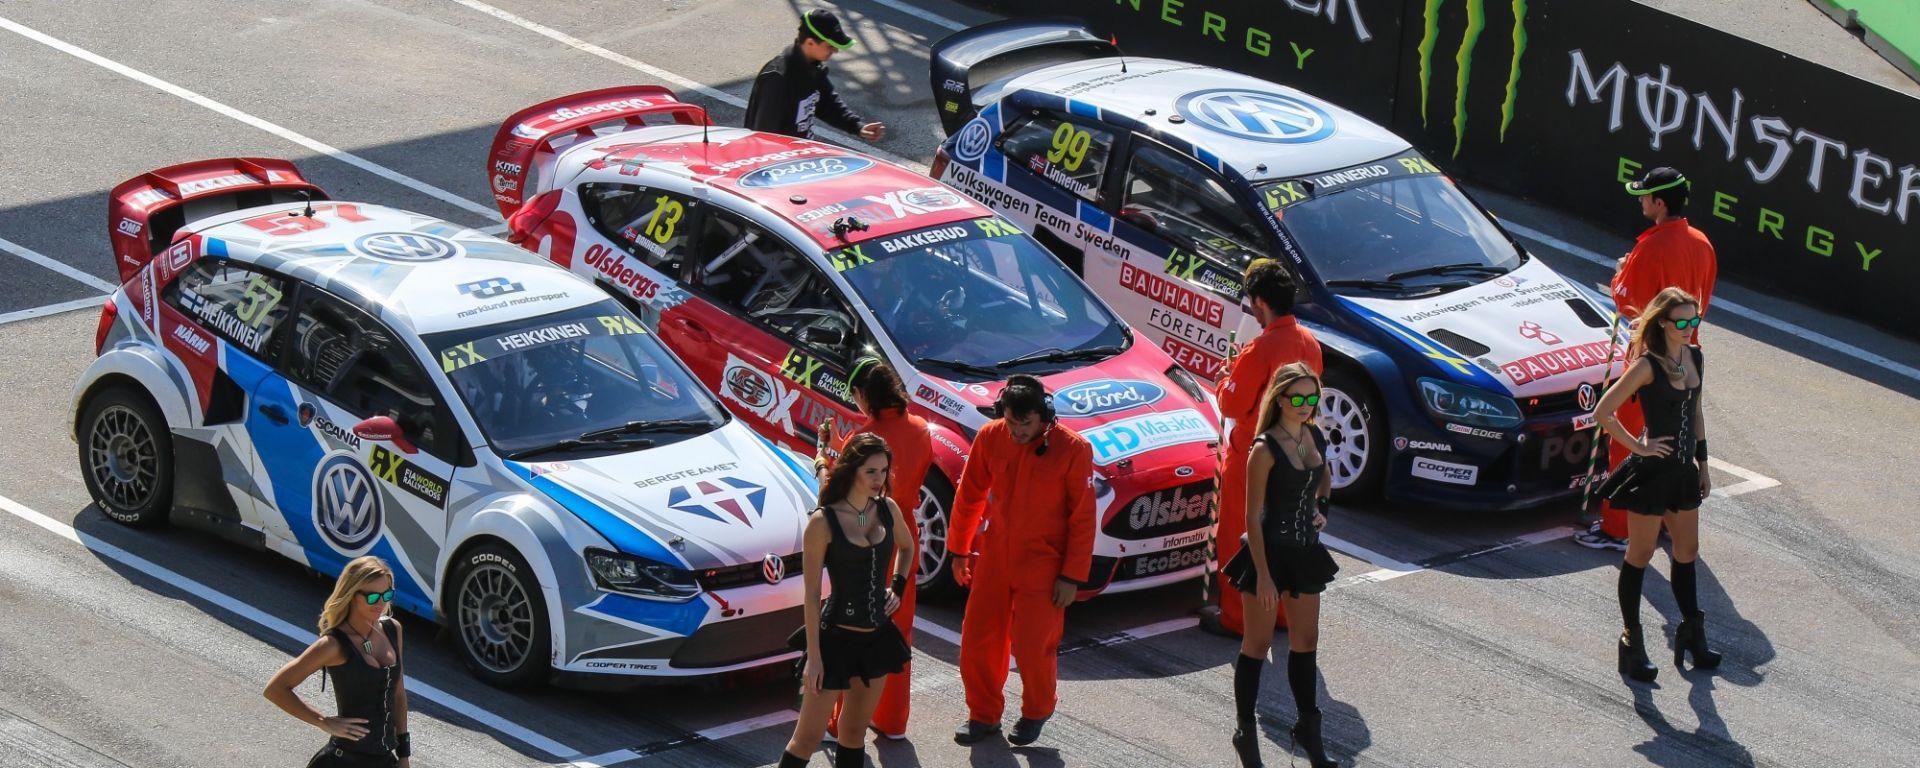 Campionato Mondiale Rallycross: il calendario 2018